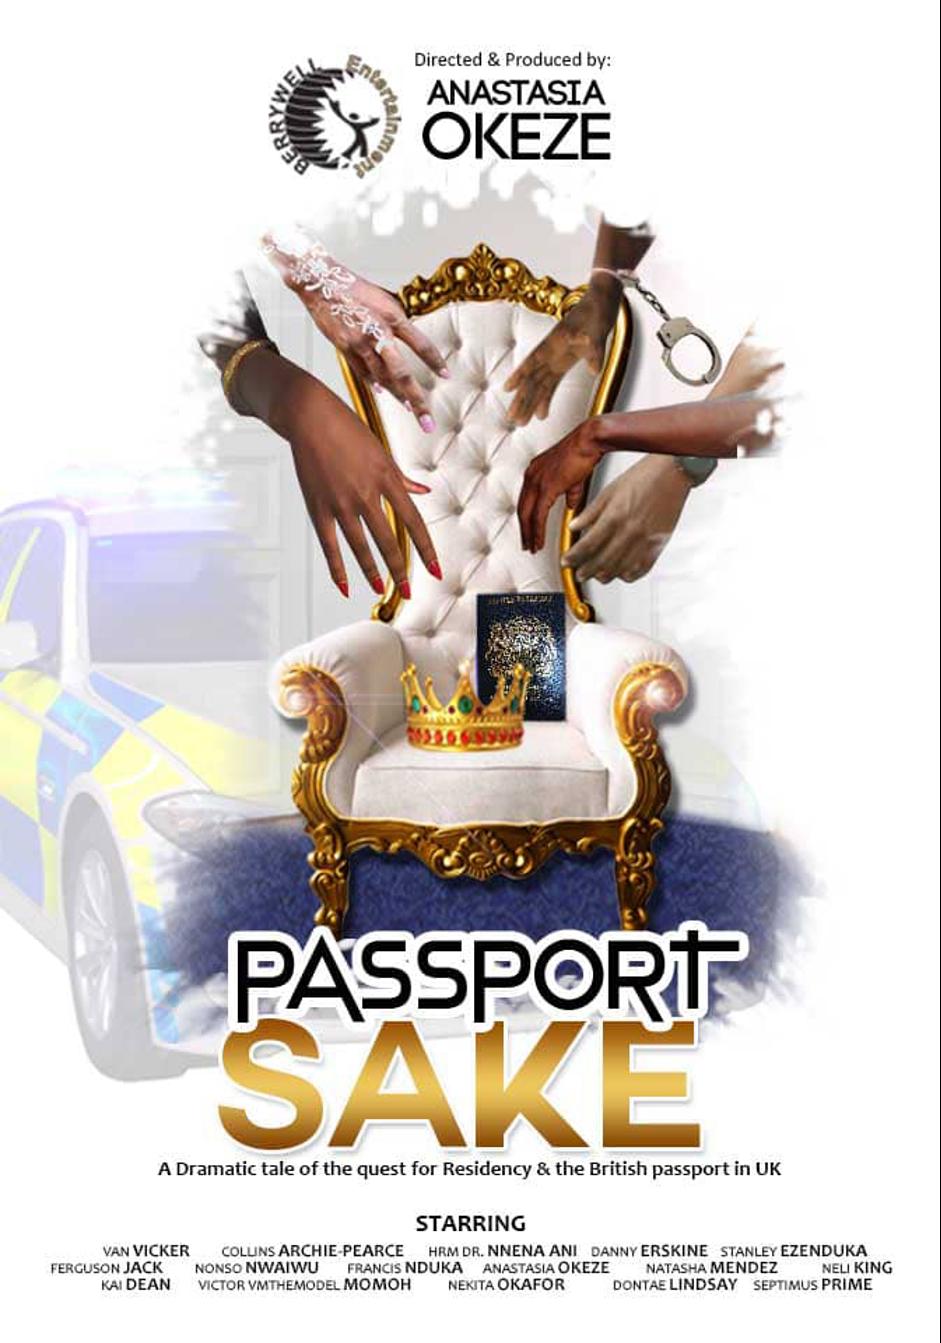 Black Female Filmmaker Anastasia Ifeanyi Okeze Makes Her Directorial Debut With Passport Sake